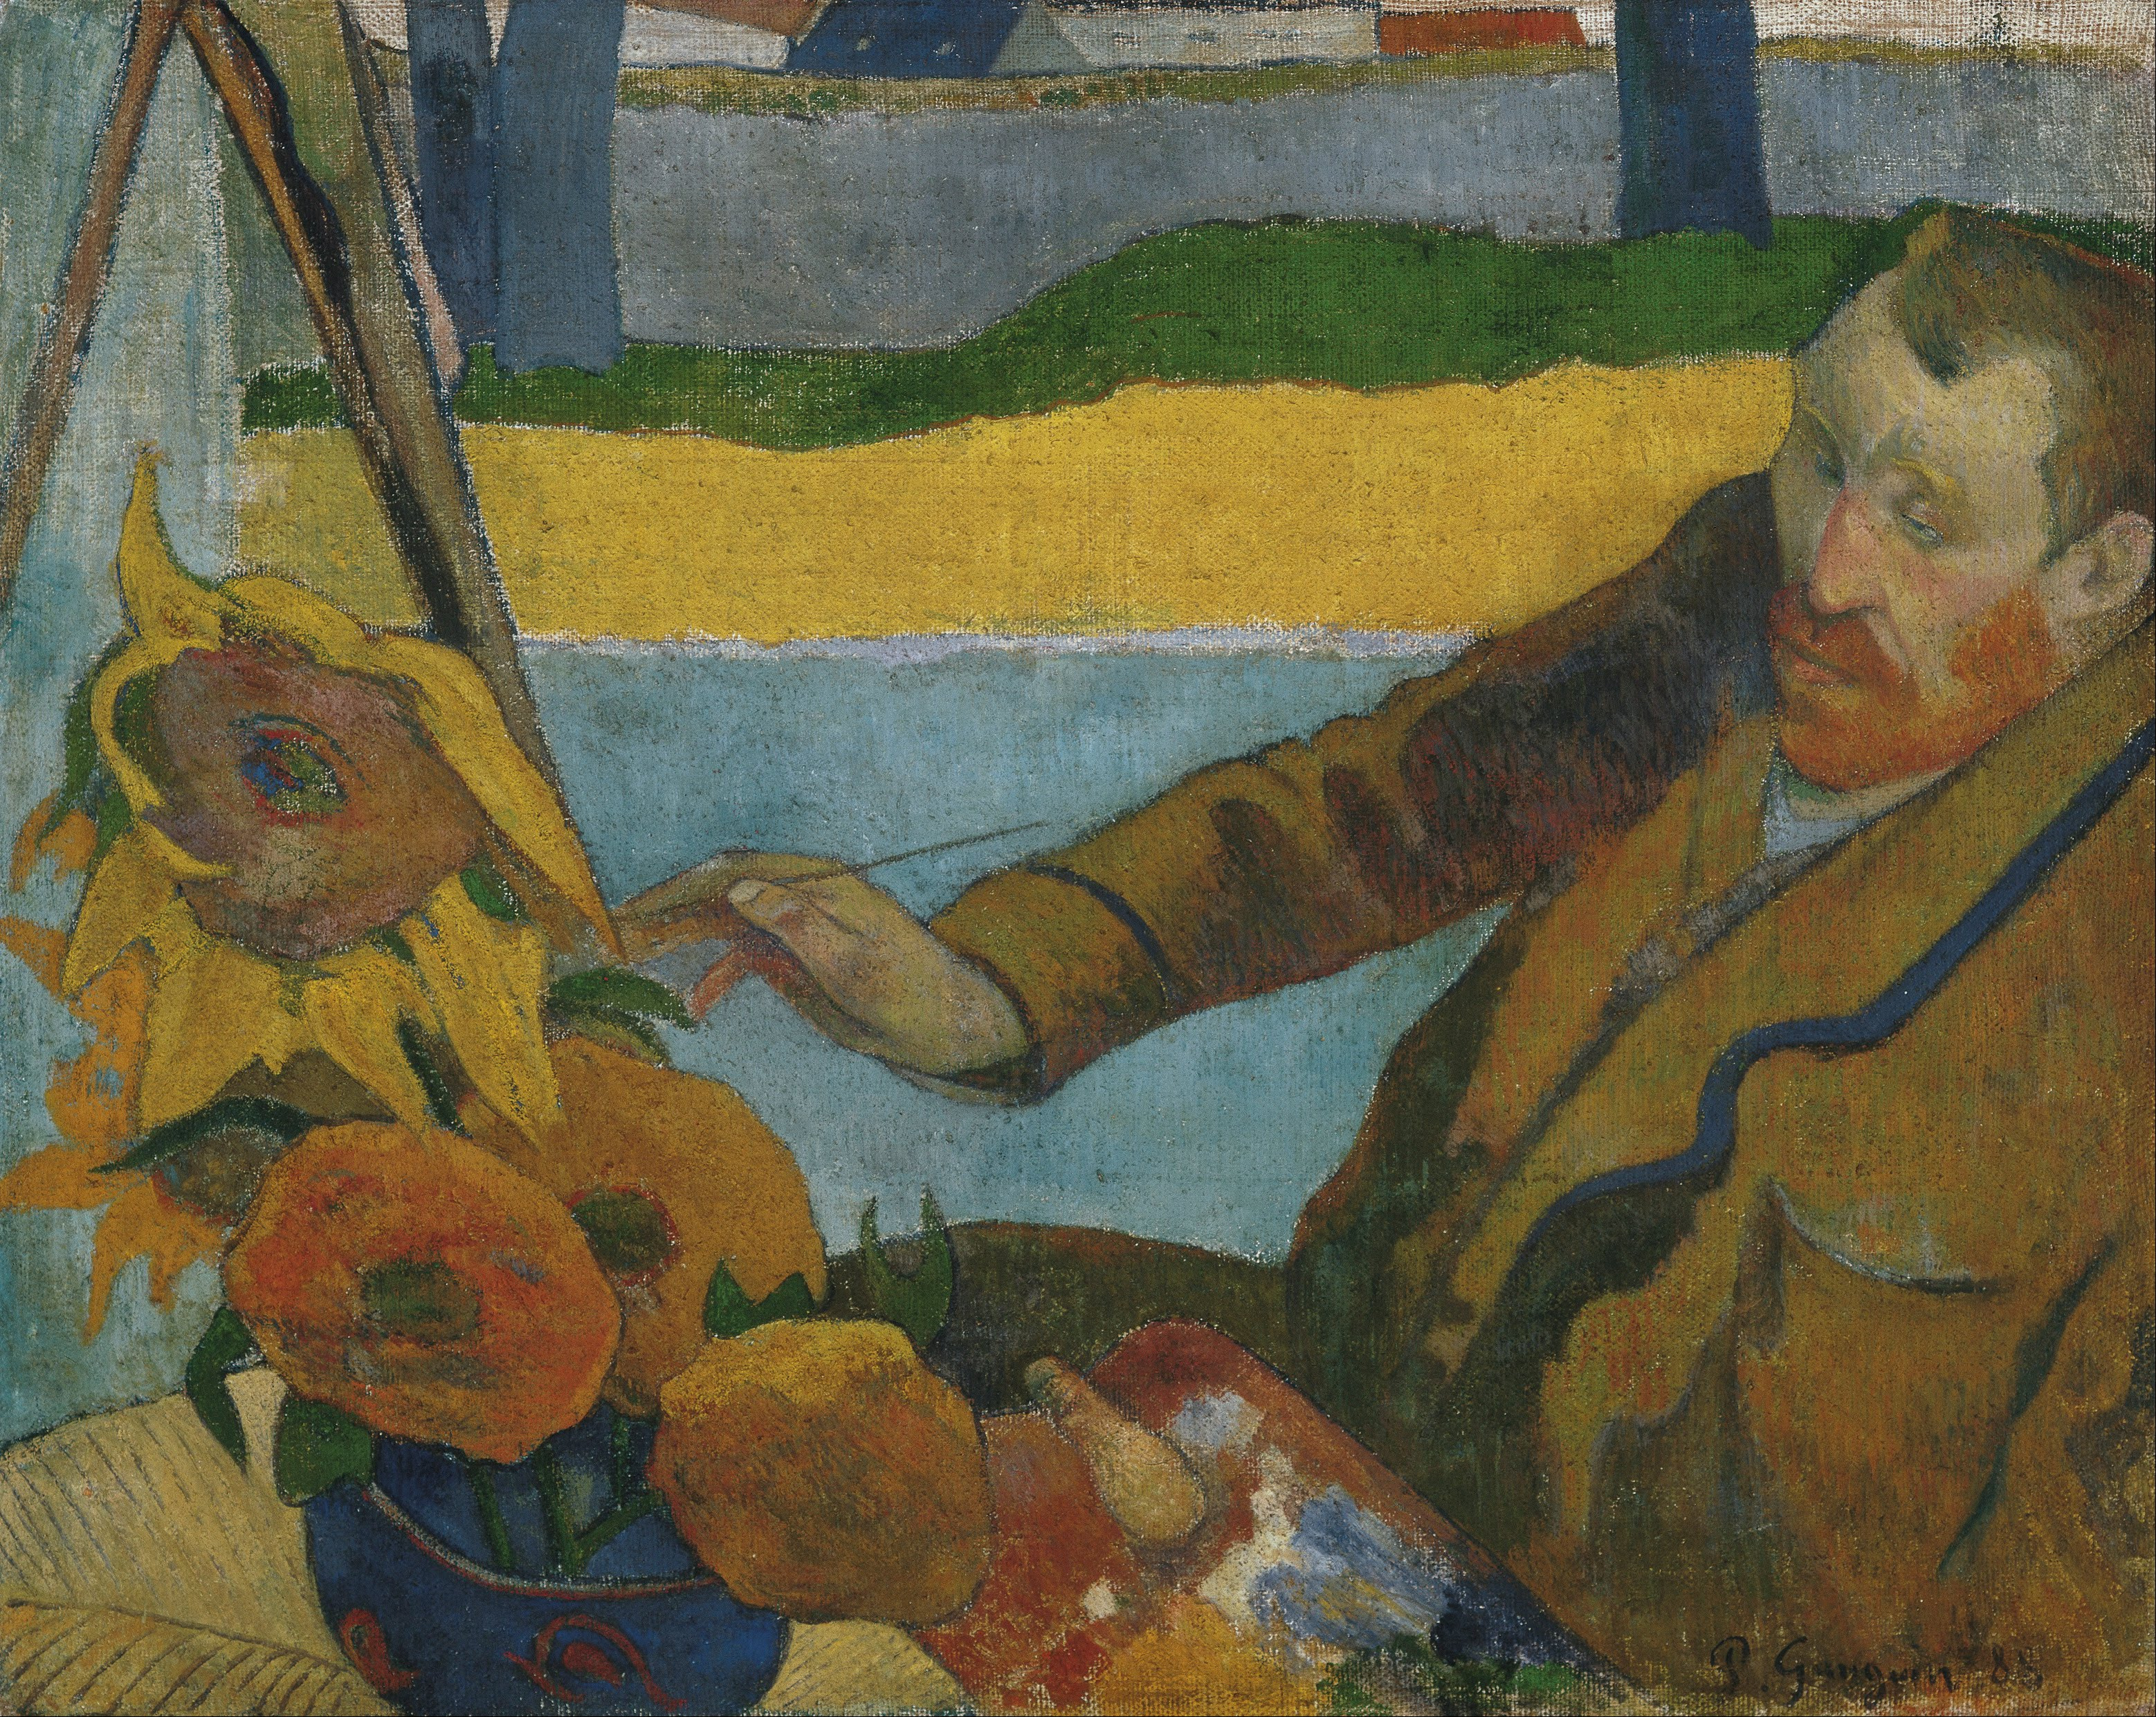 053517349e Posthumous fame of Vincent van Gogh - Wikipedia